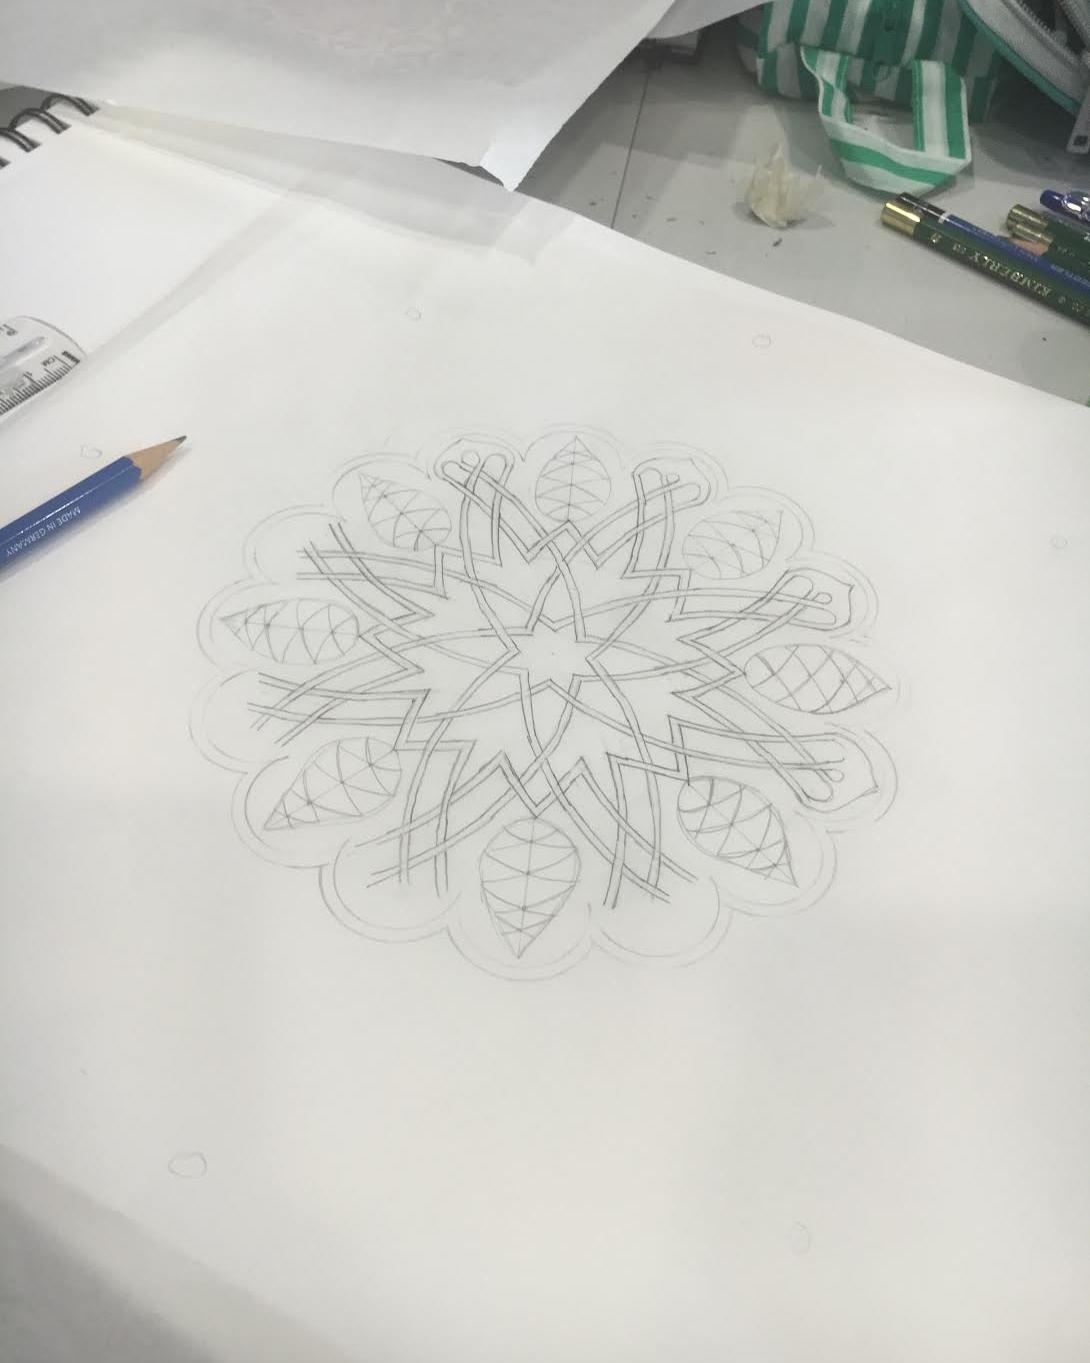 Courtney Beyer workshop drawing.jpg